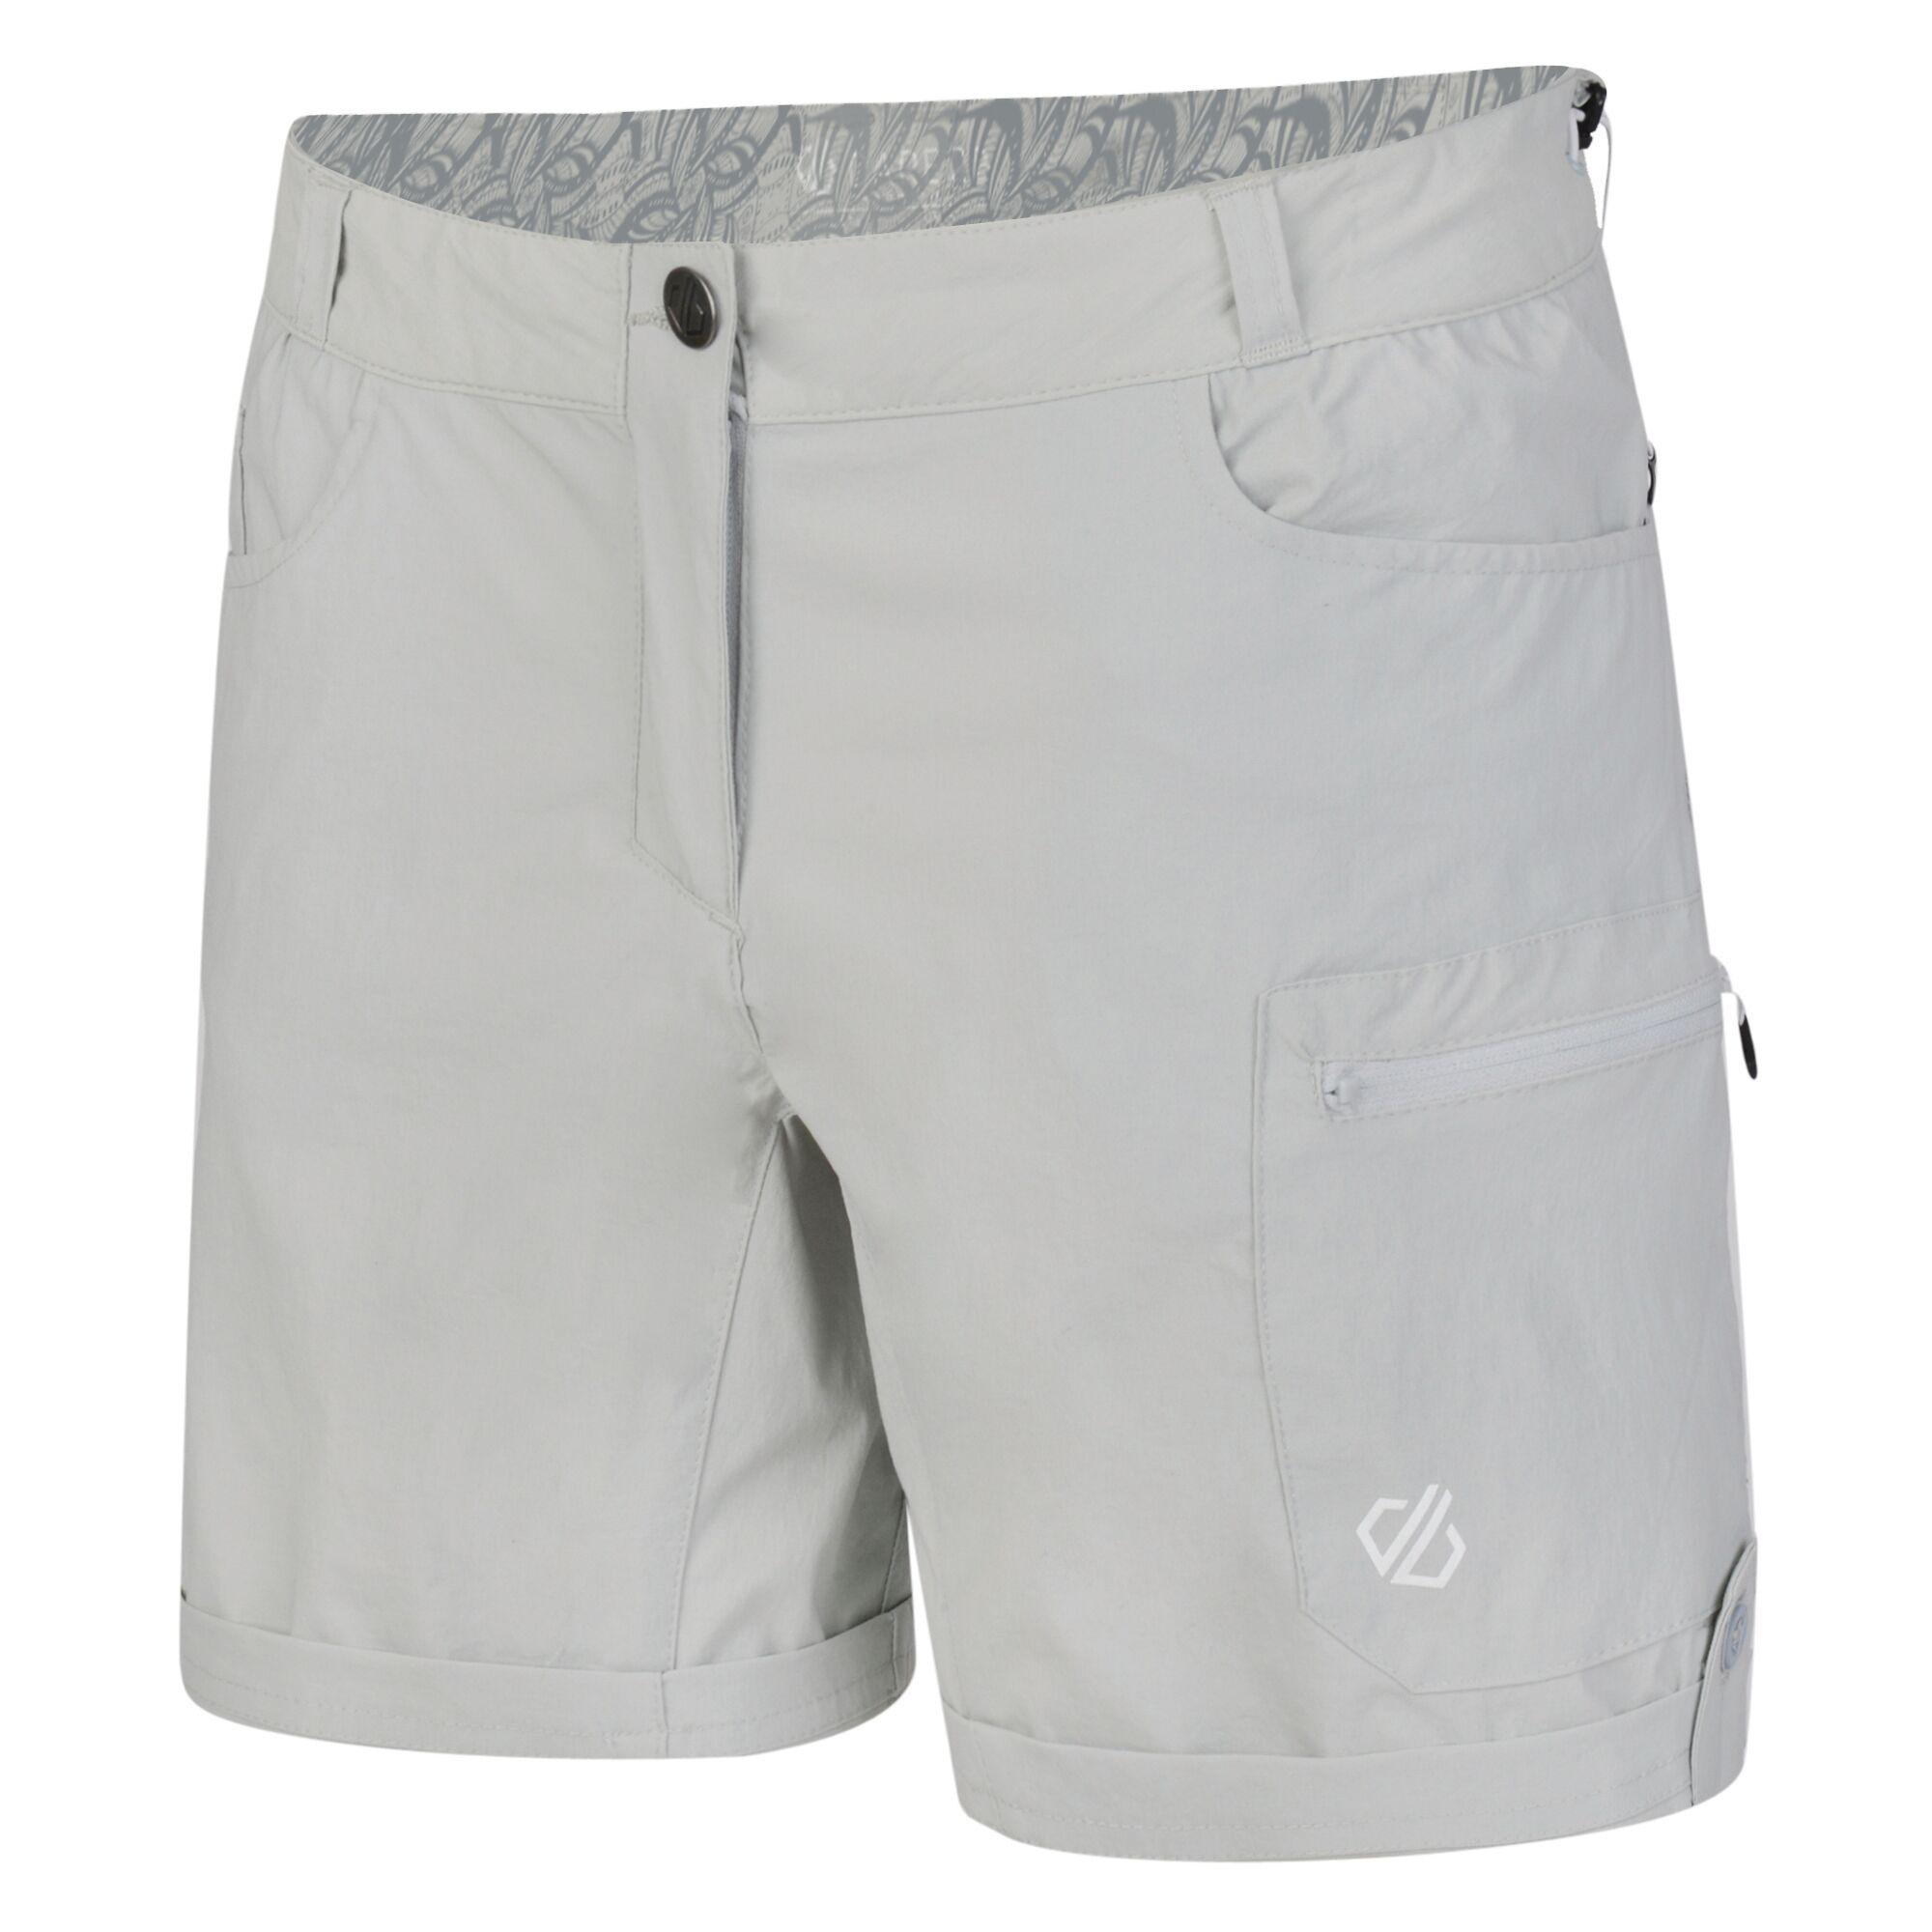 Dare2b Womens/Ladies Melodic II Multi Pocket Walking Shorts